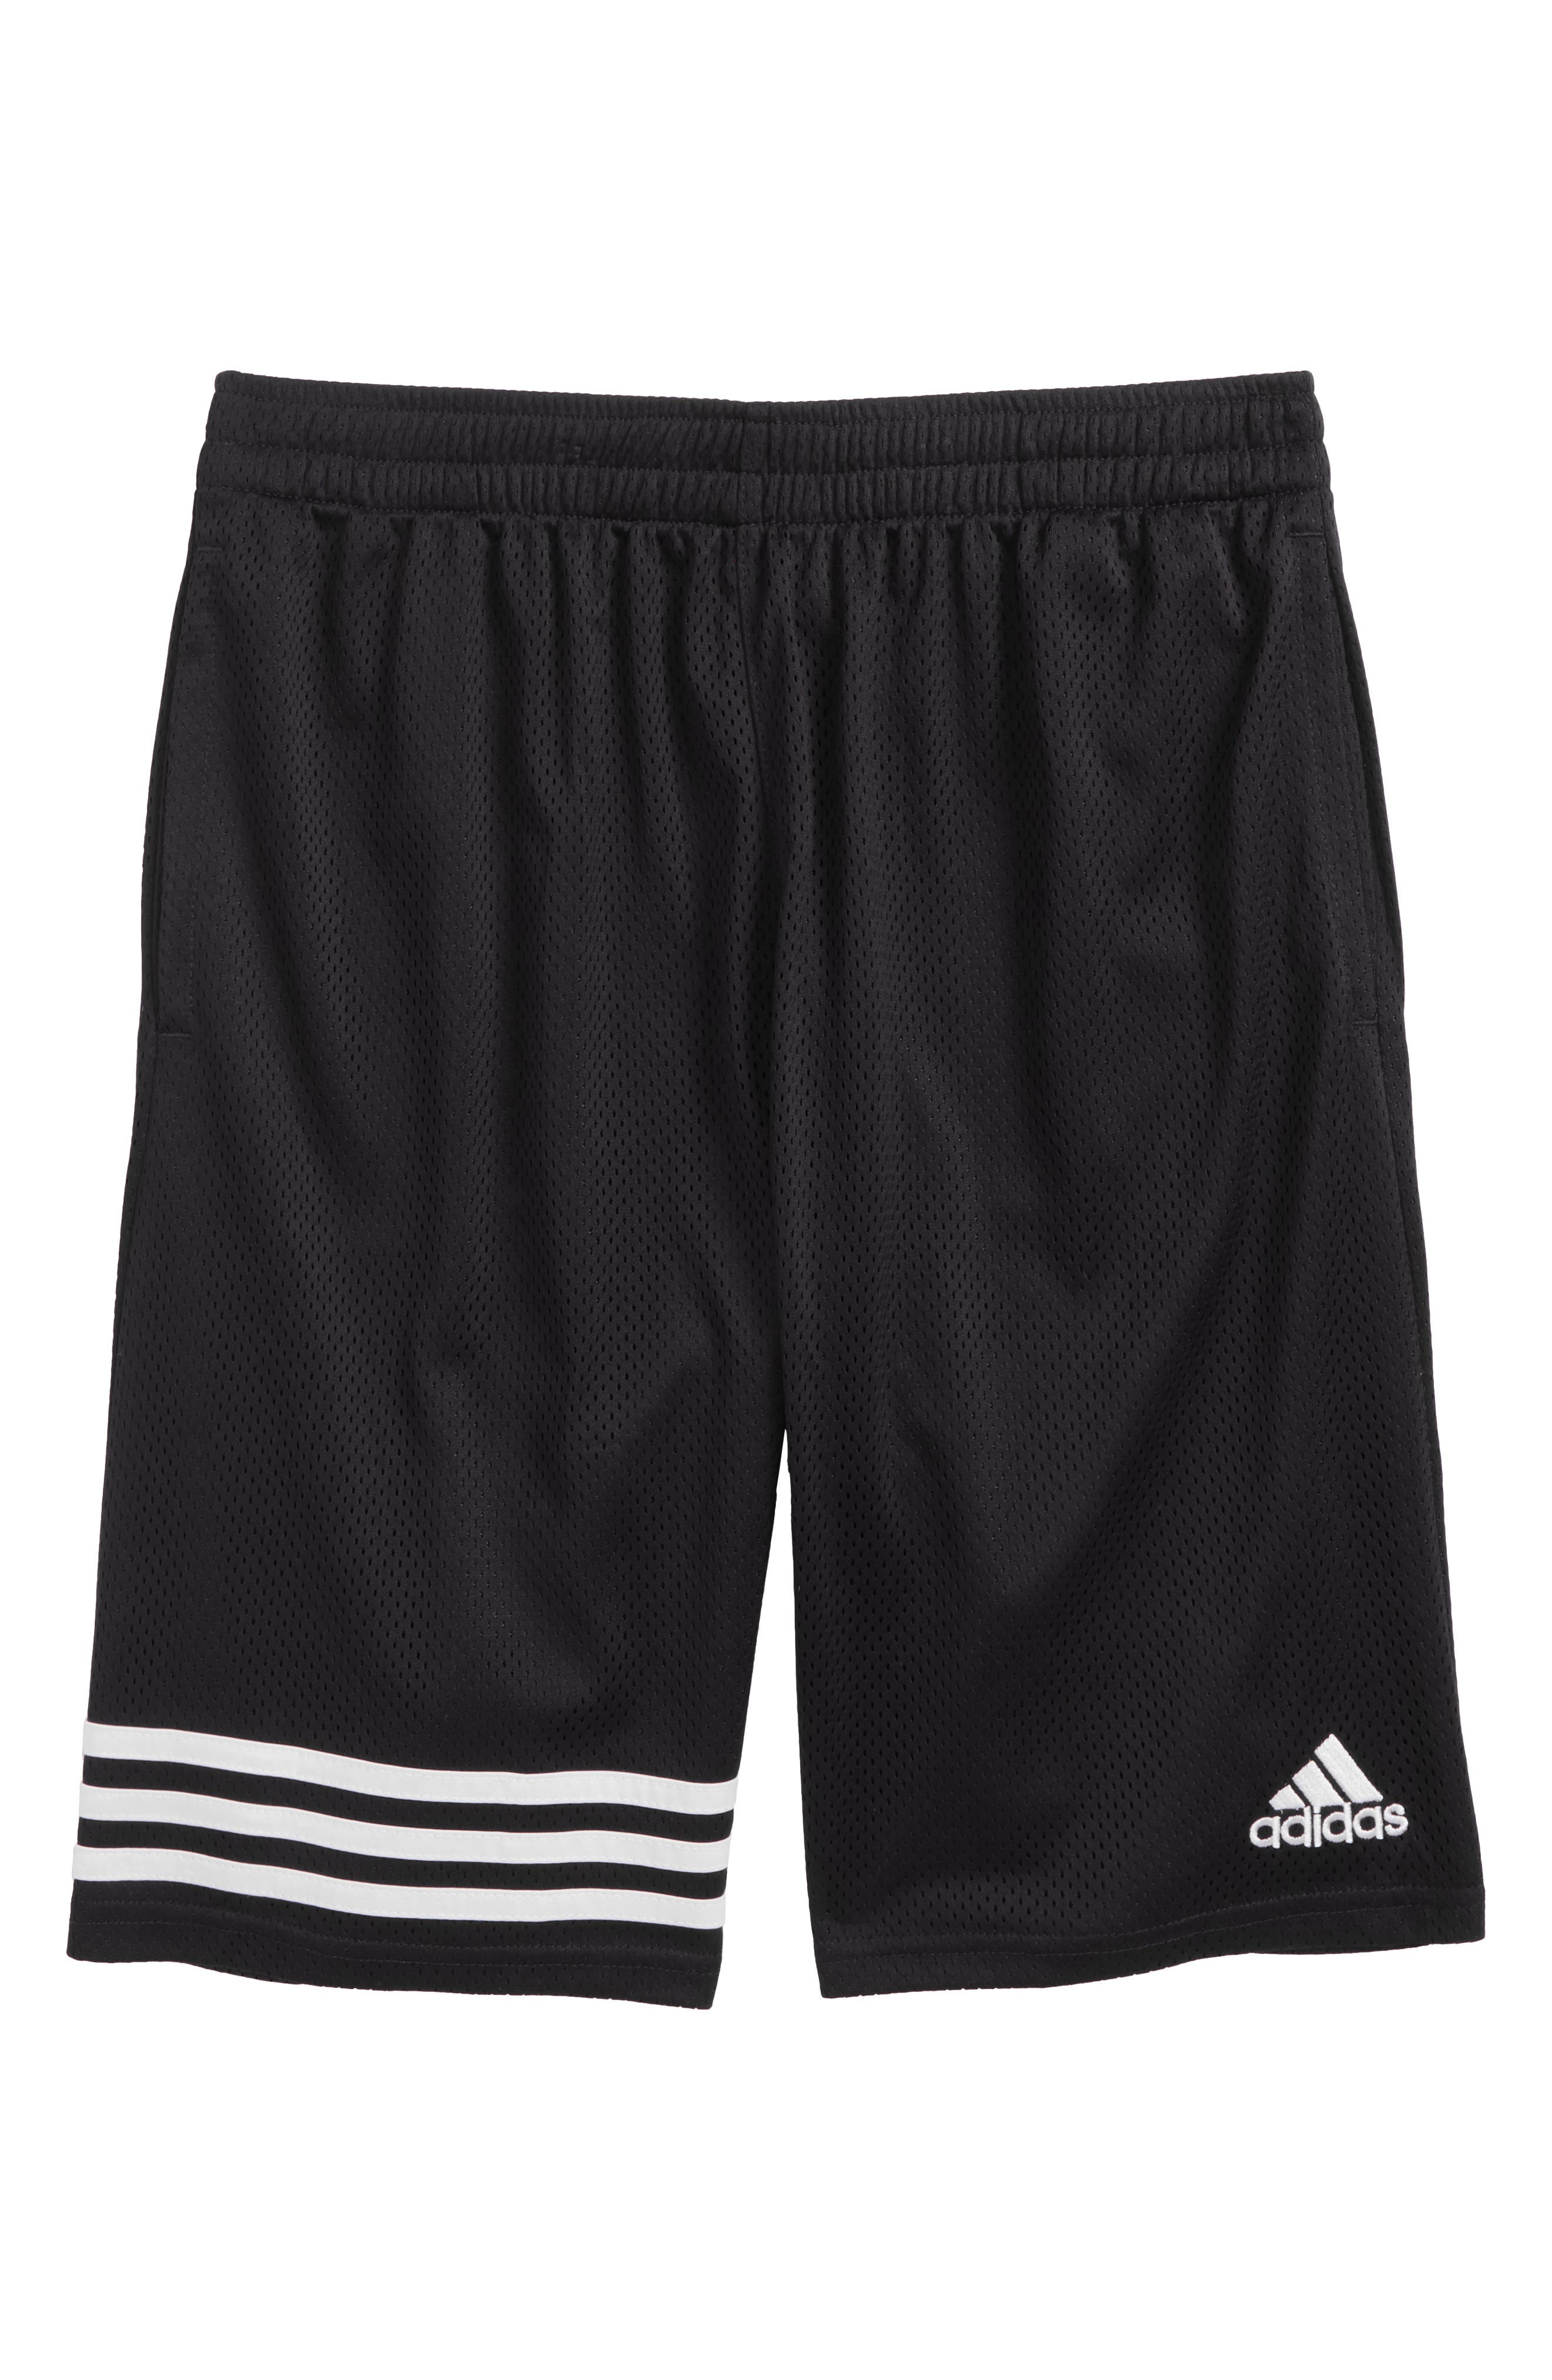 Replenishment Defender Shorts,                         Main,                         color,